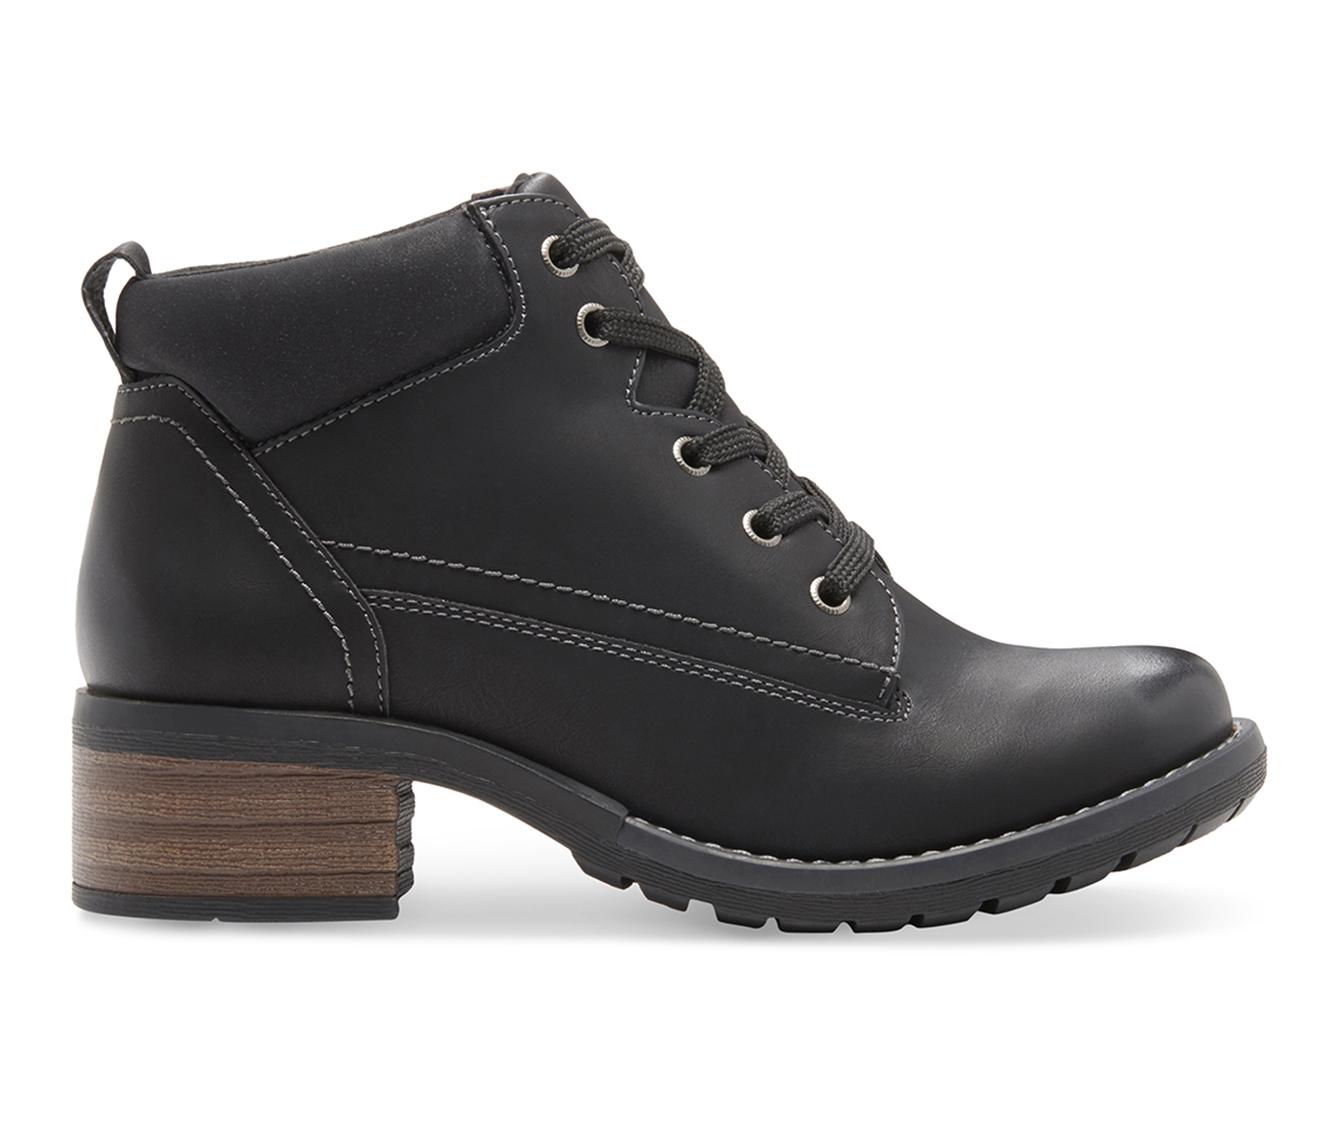 Eastland Bandana Women's Boot (Black Faux Leather)